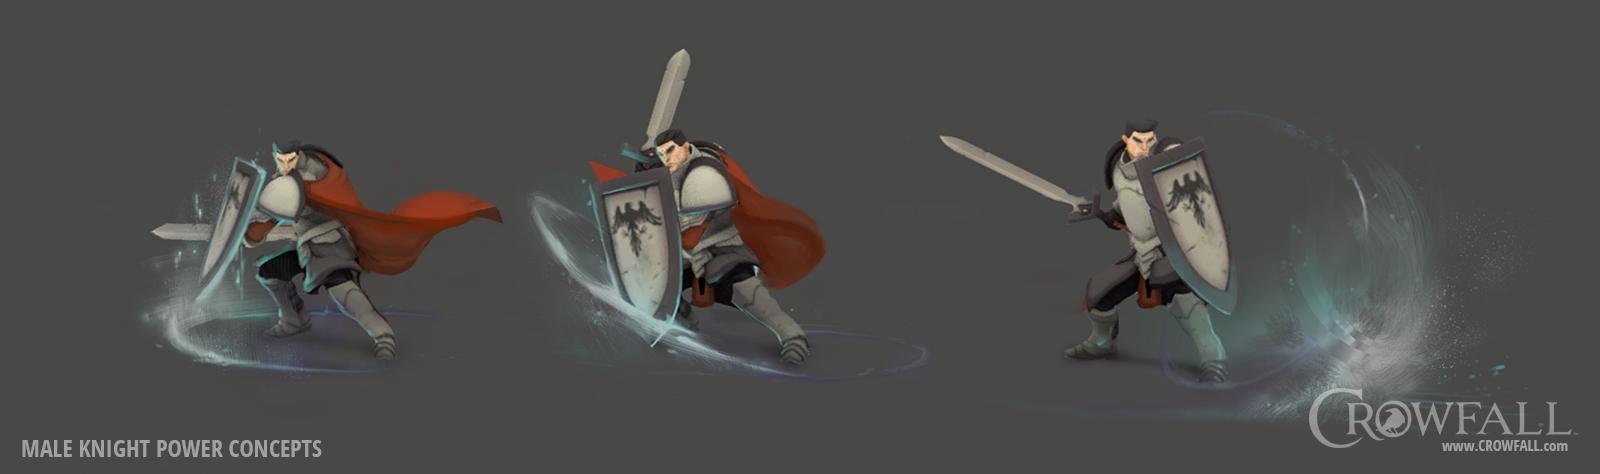 Knight_PowerConcepts_02.jpg